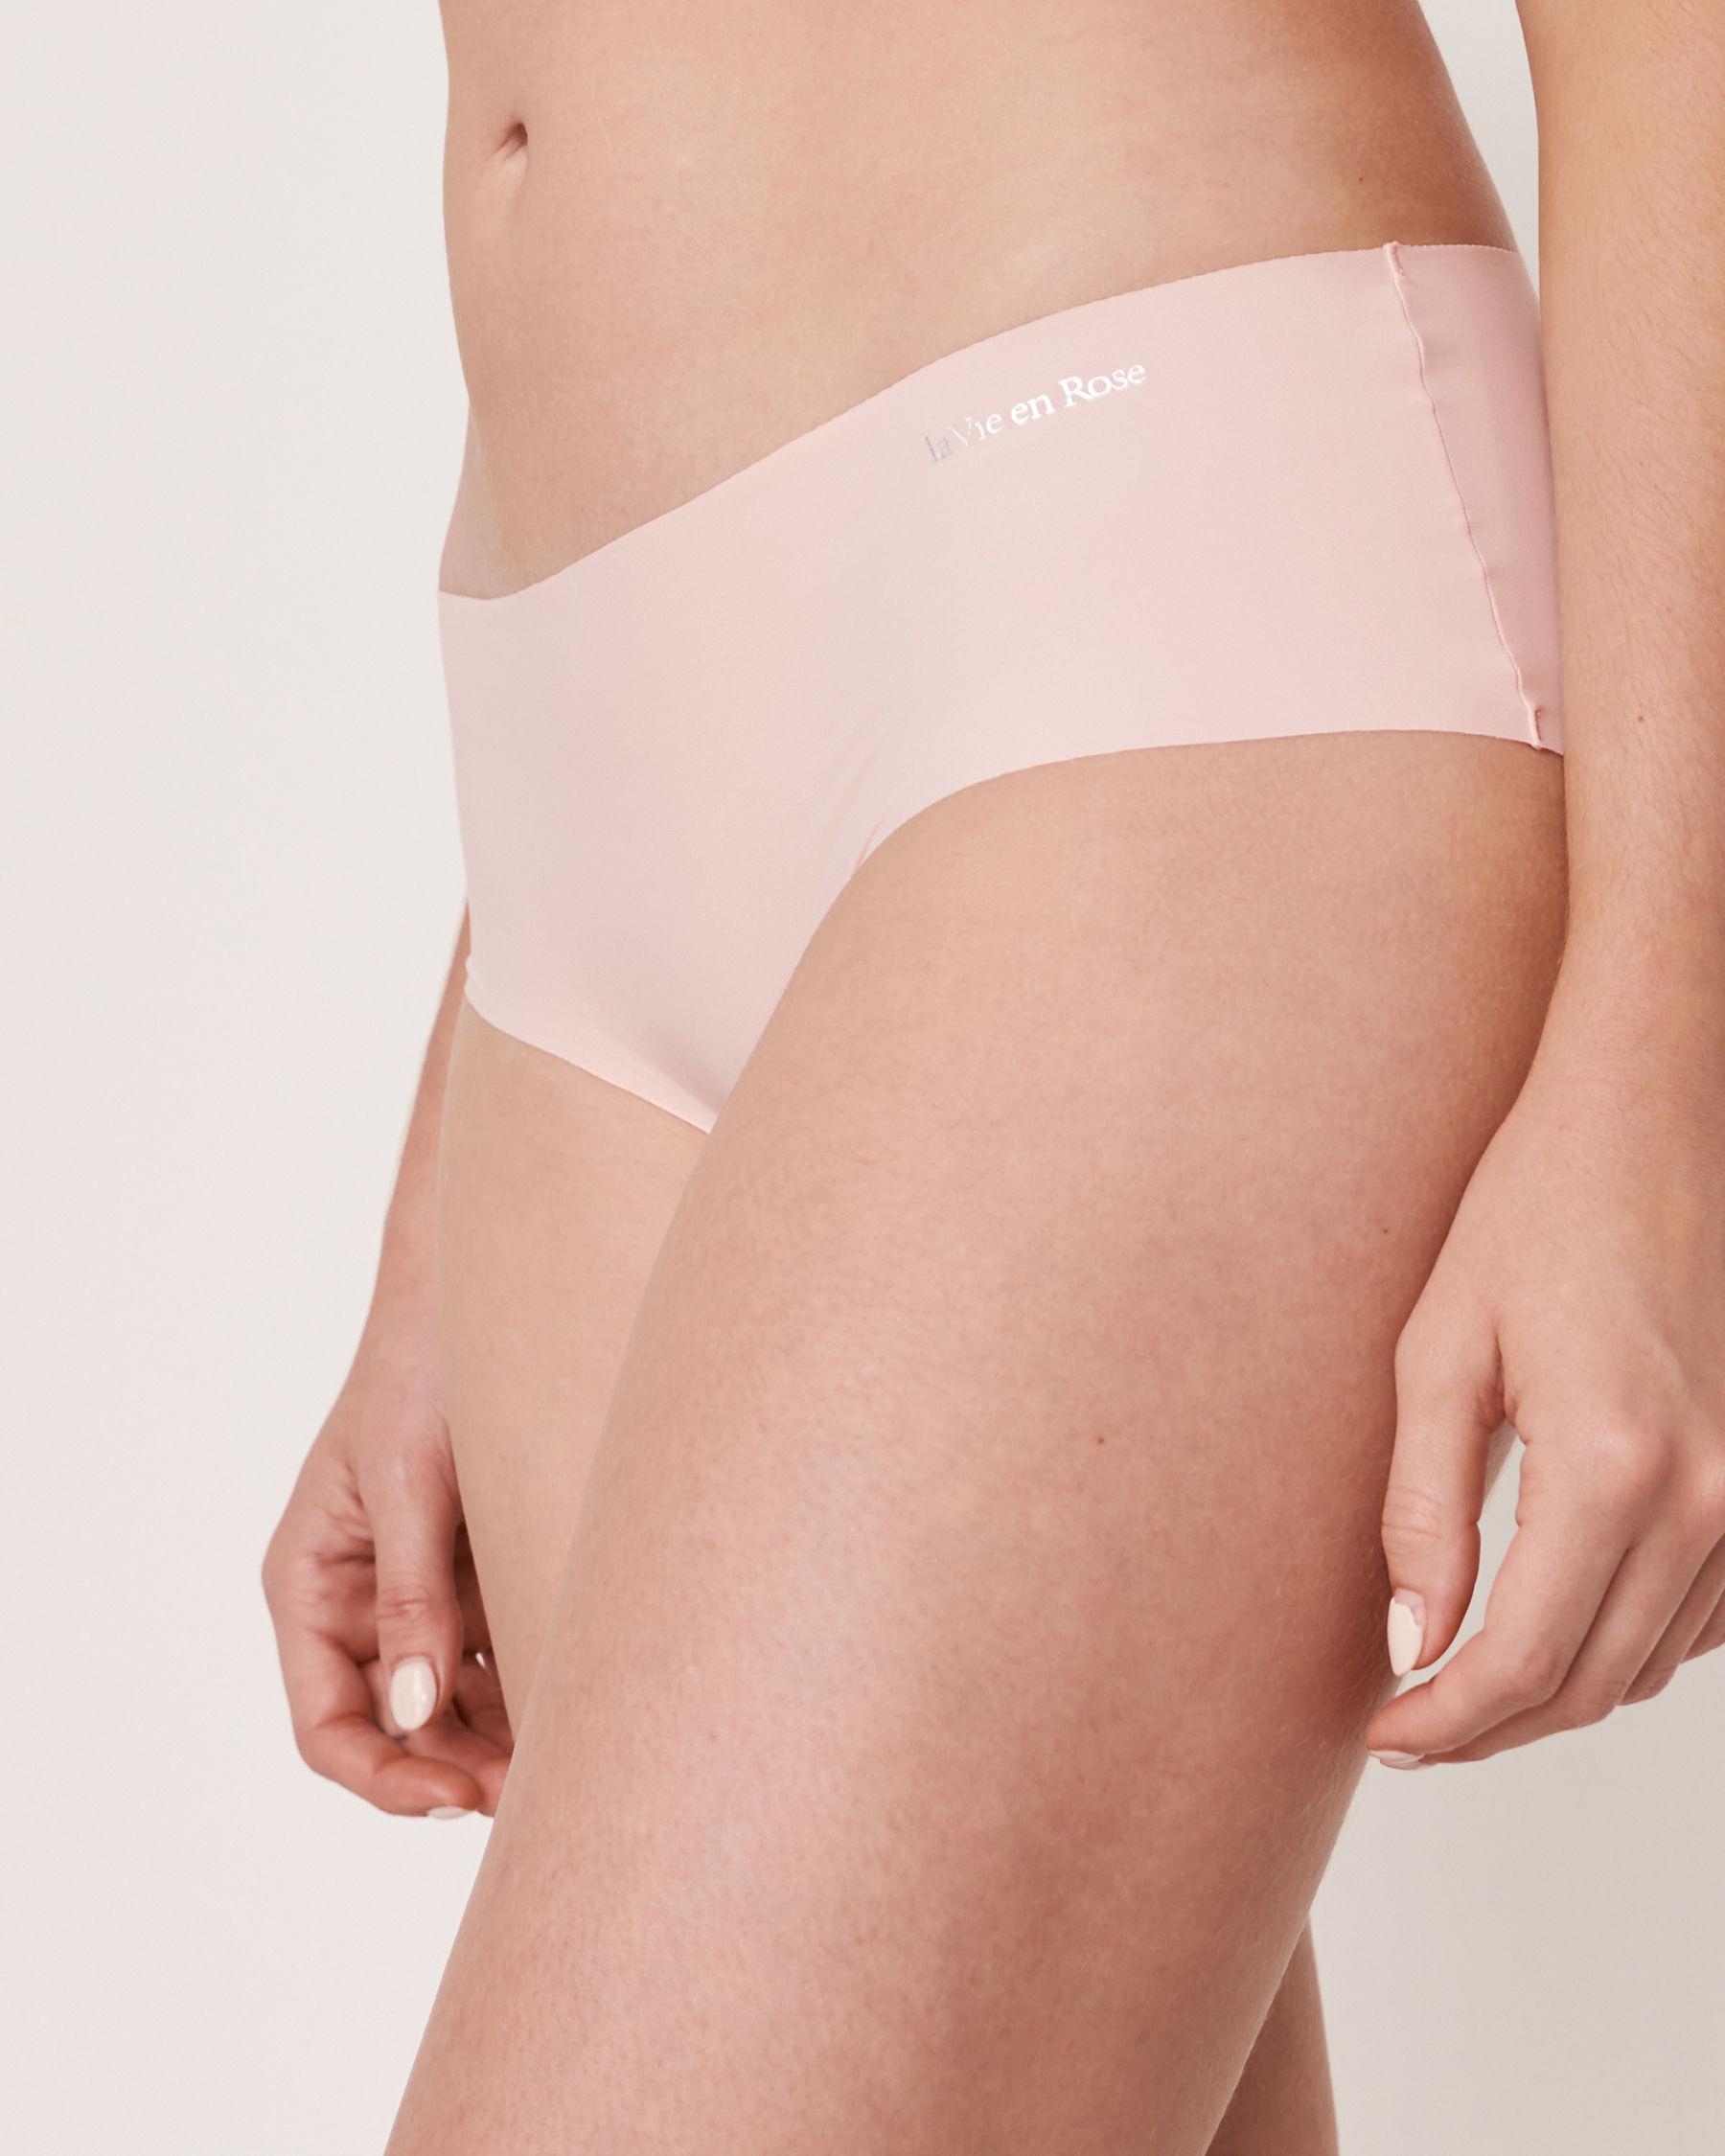 LA VIE EN ROSE Seamless Hiphugger Panty Light pink 20200048 - View1